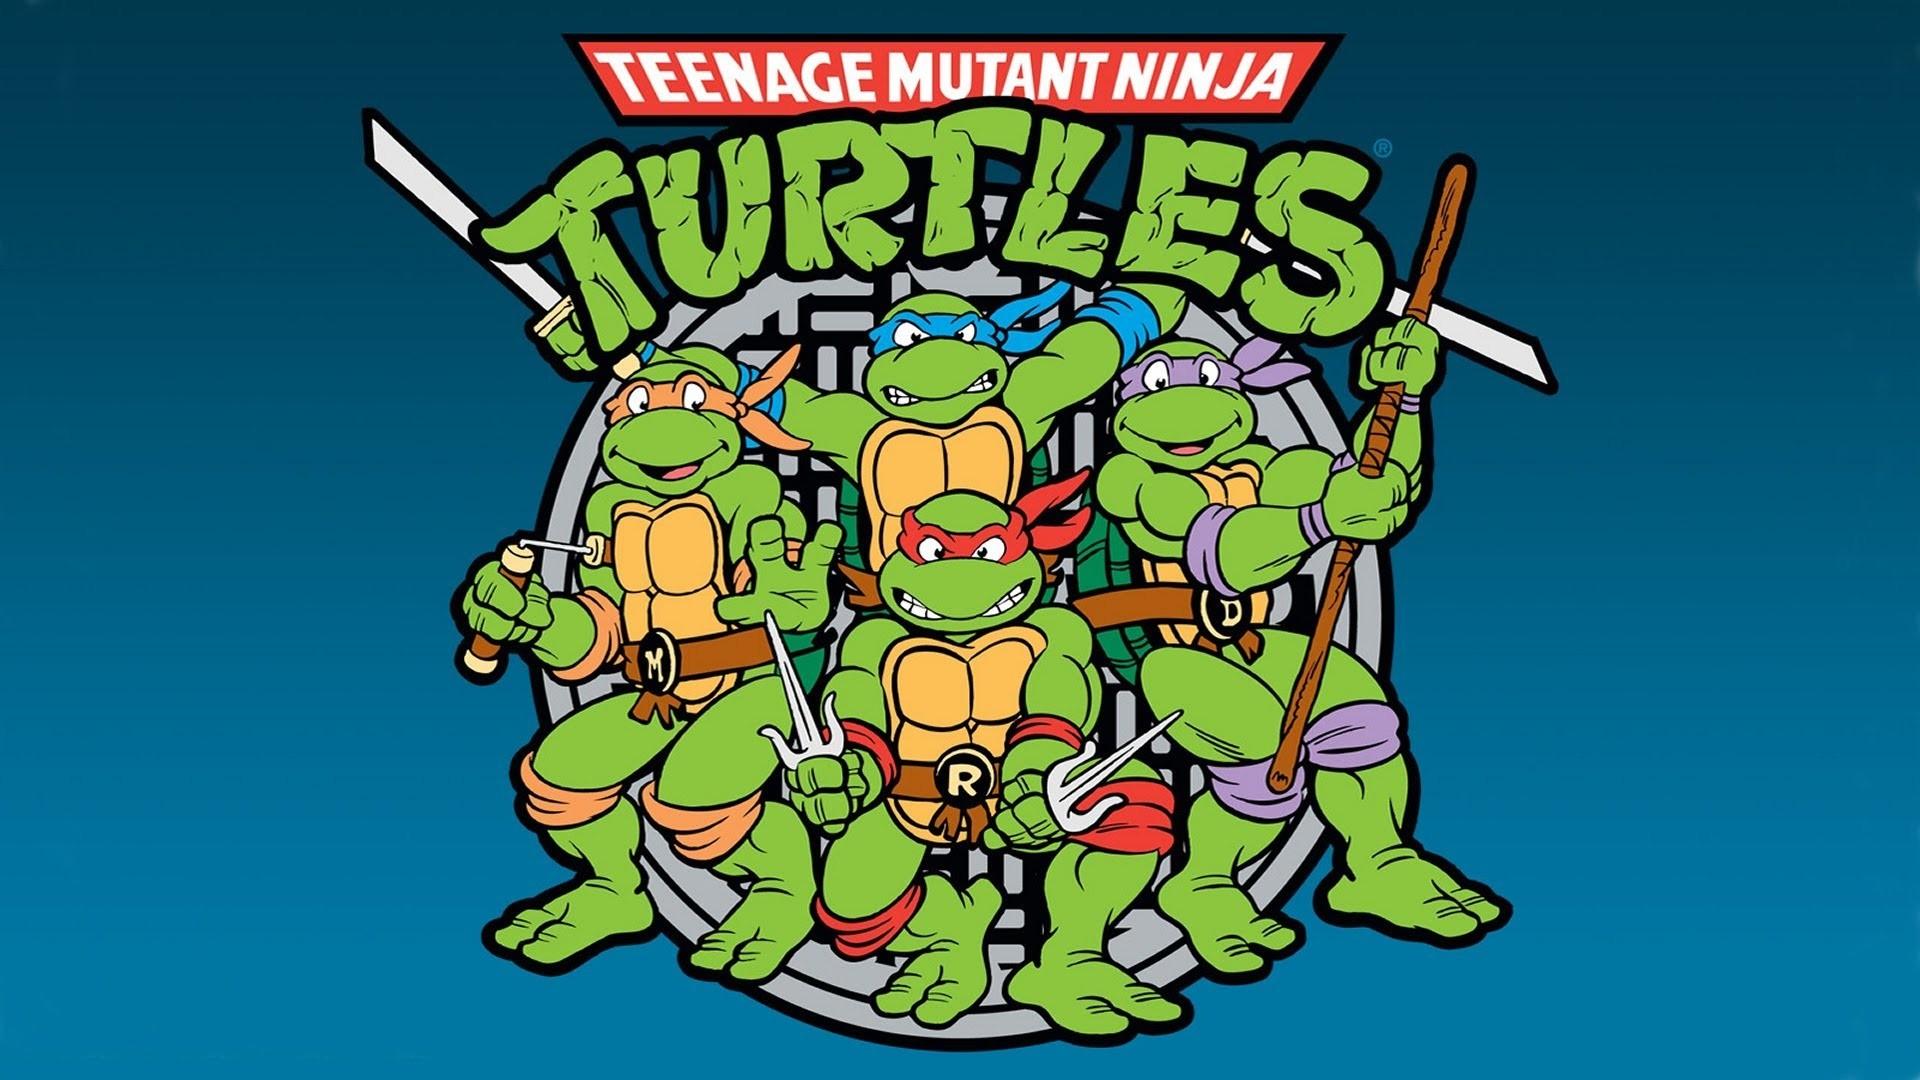 Teenage mutant ninja turtles wallpaper hd nick